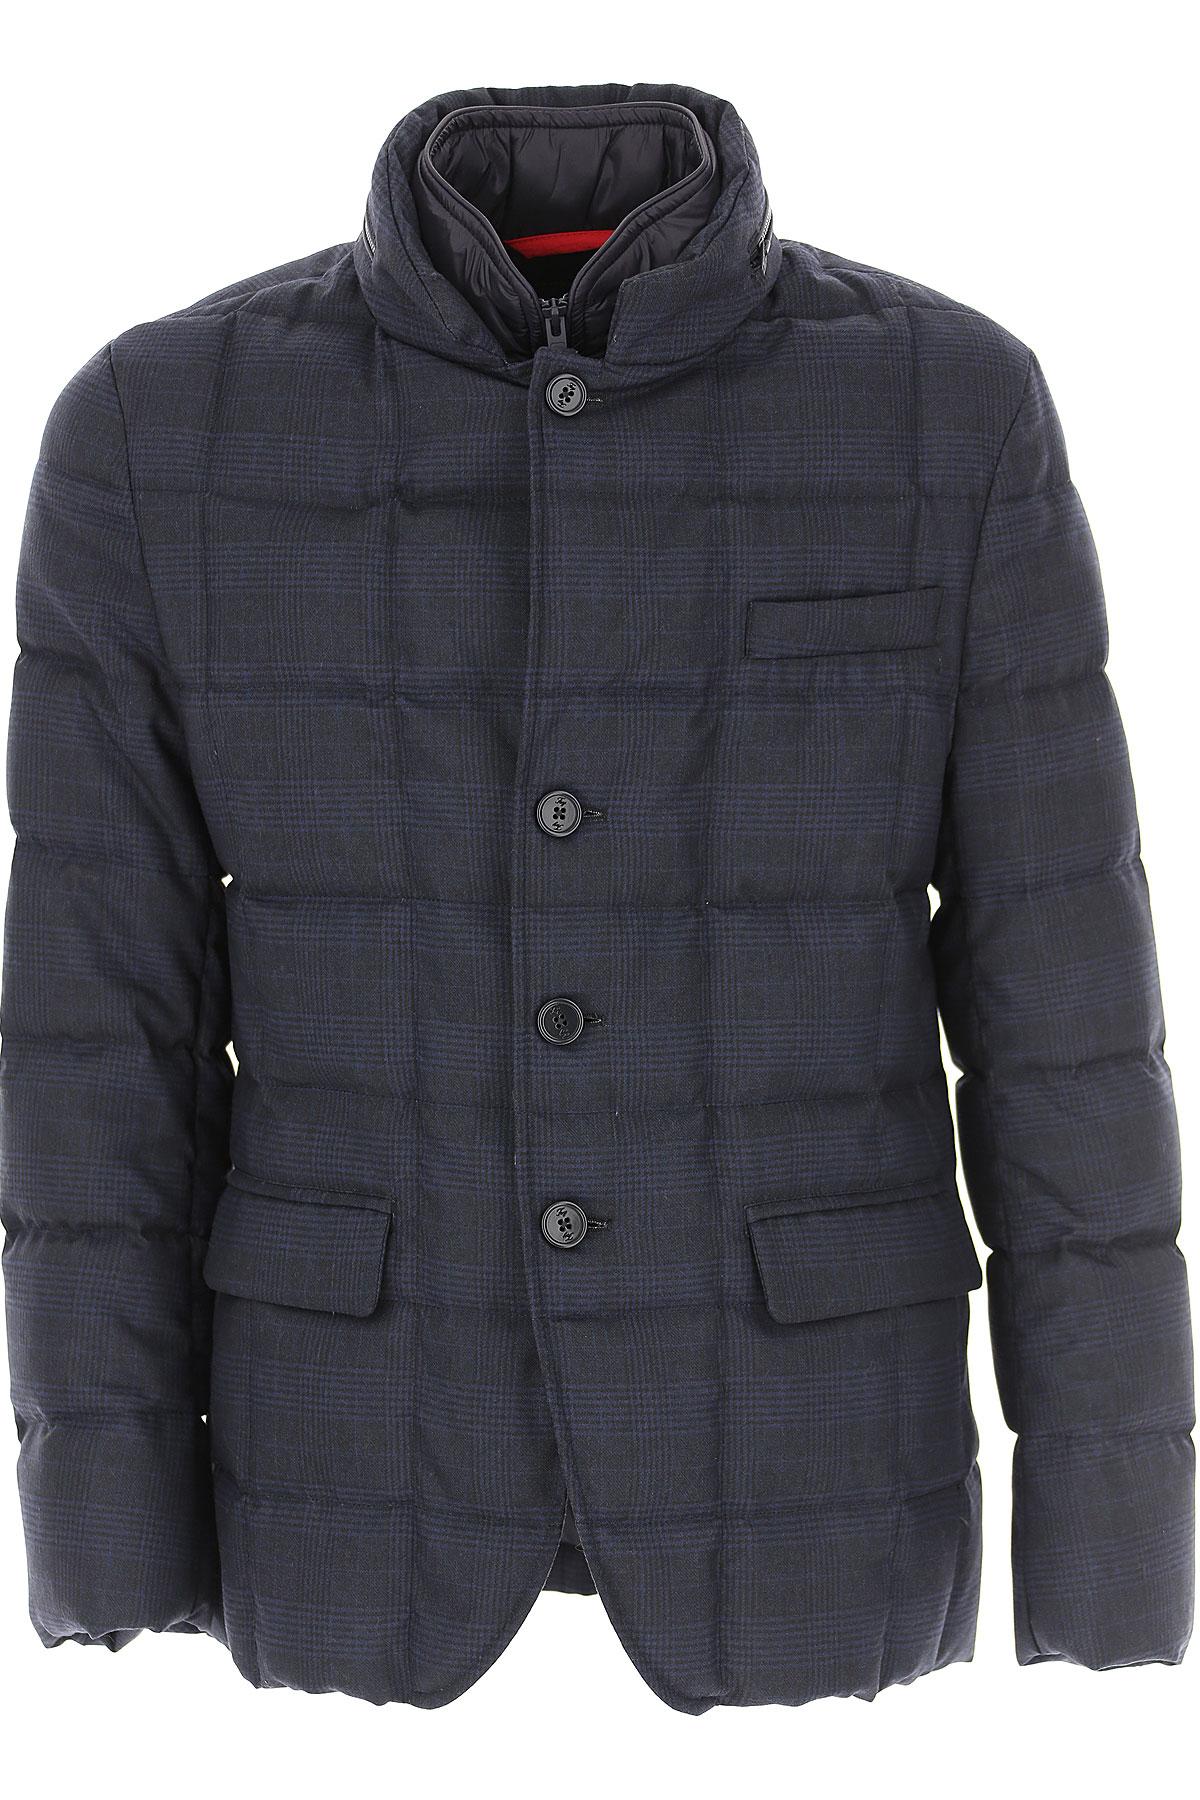 Fay Down Jacket for Men, Puffer Ski Jacket On Sale, Dark Blue, Down, 2019, L M XL